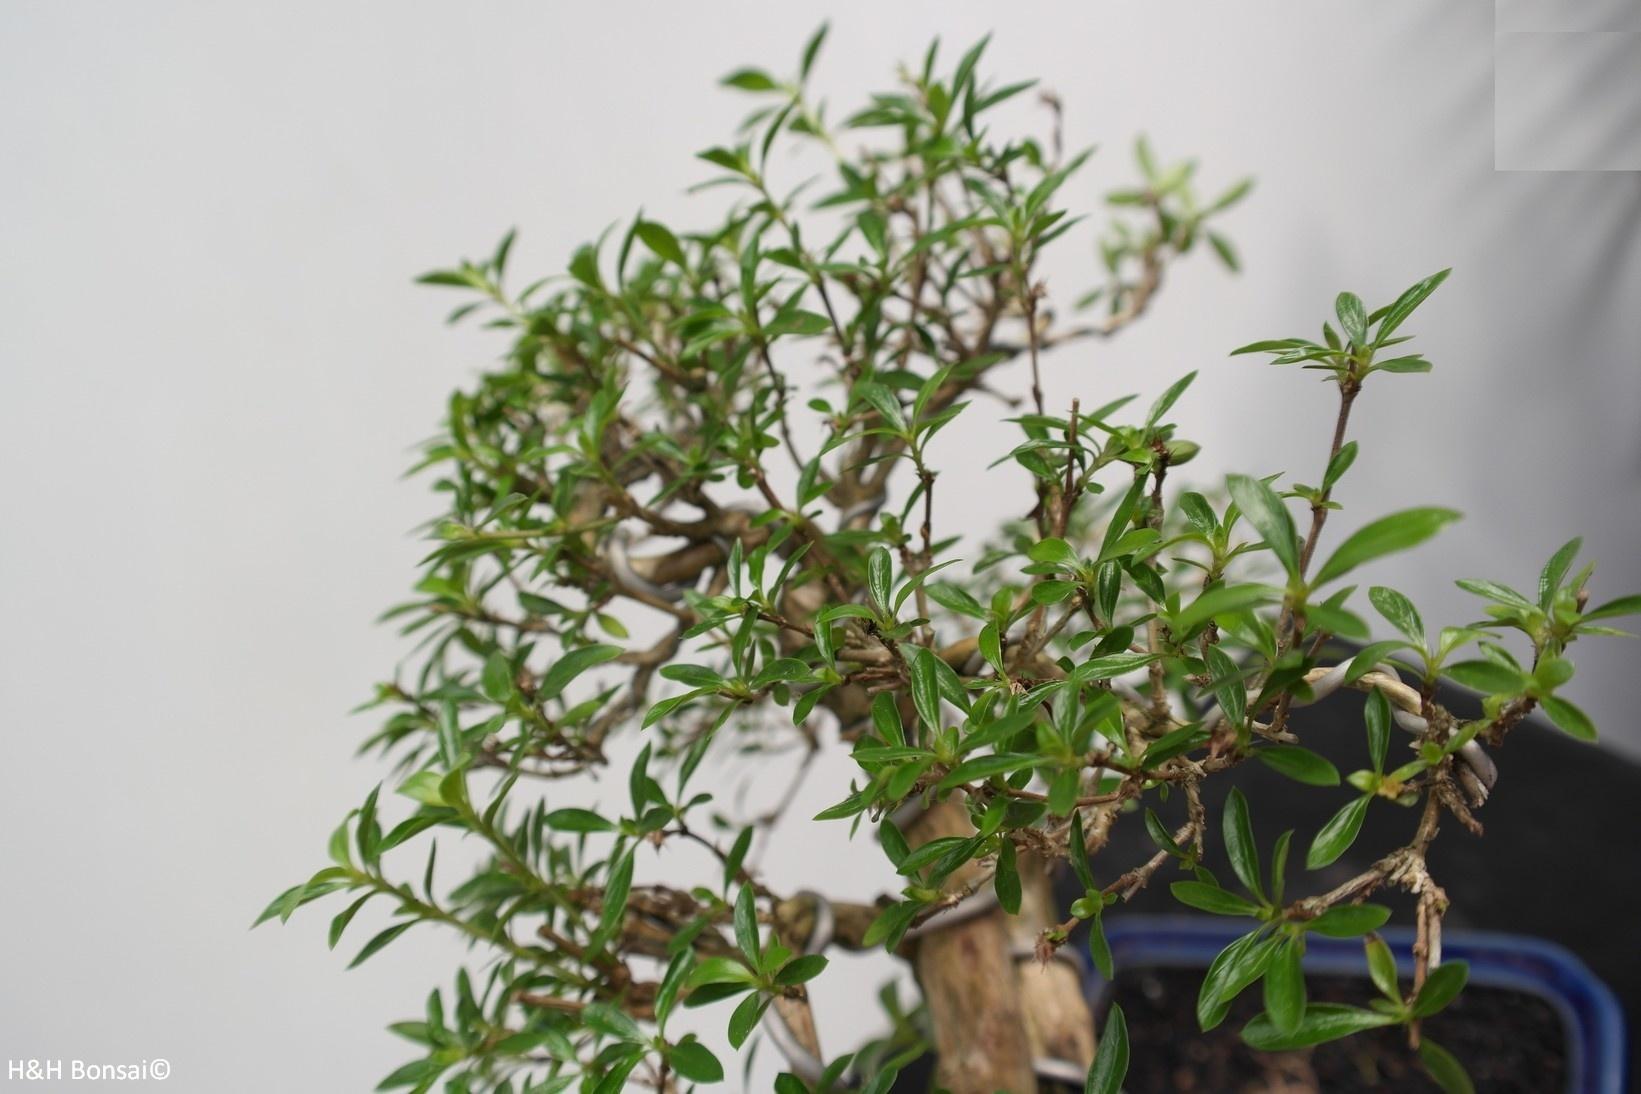 Bonsai Snow Rose, Serissa foetida, no. 7863